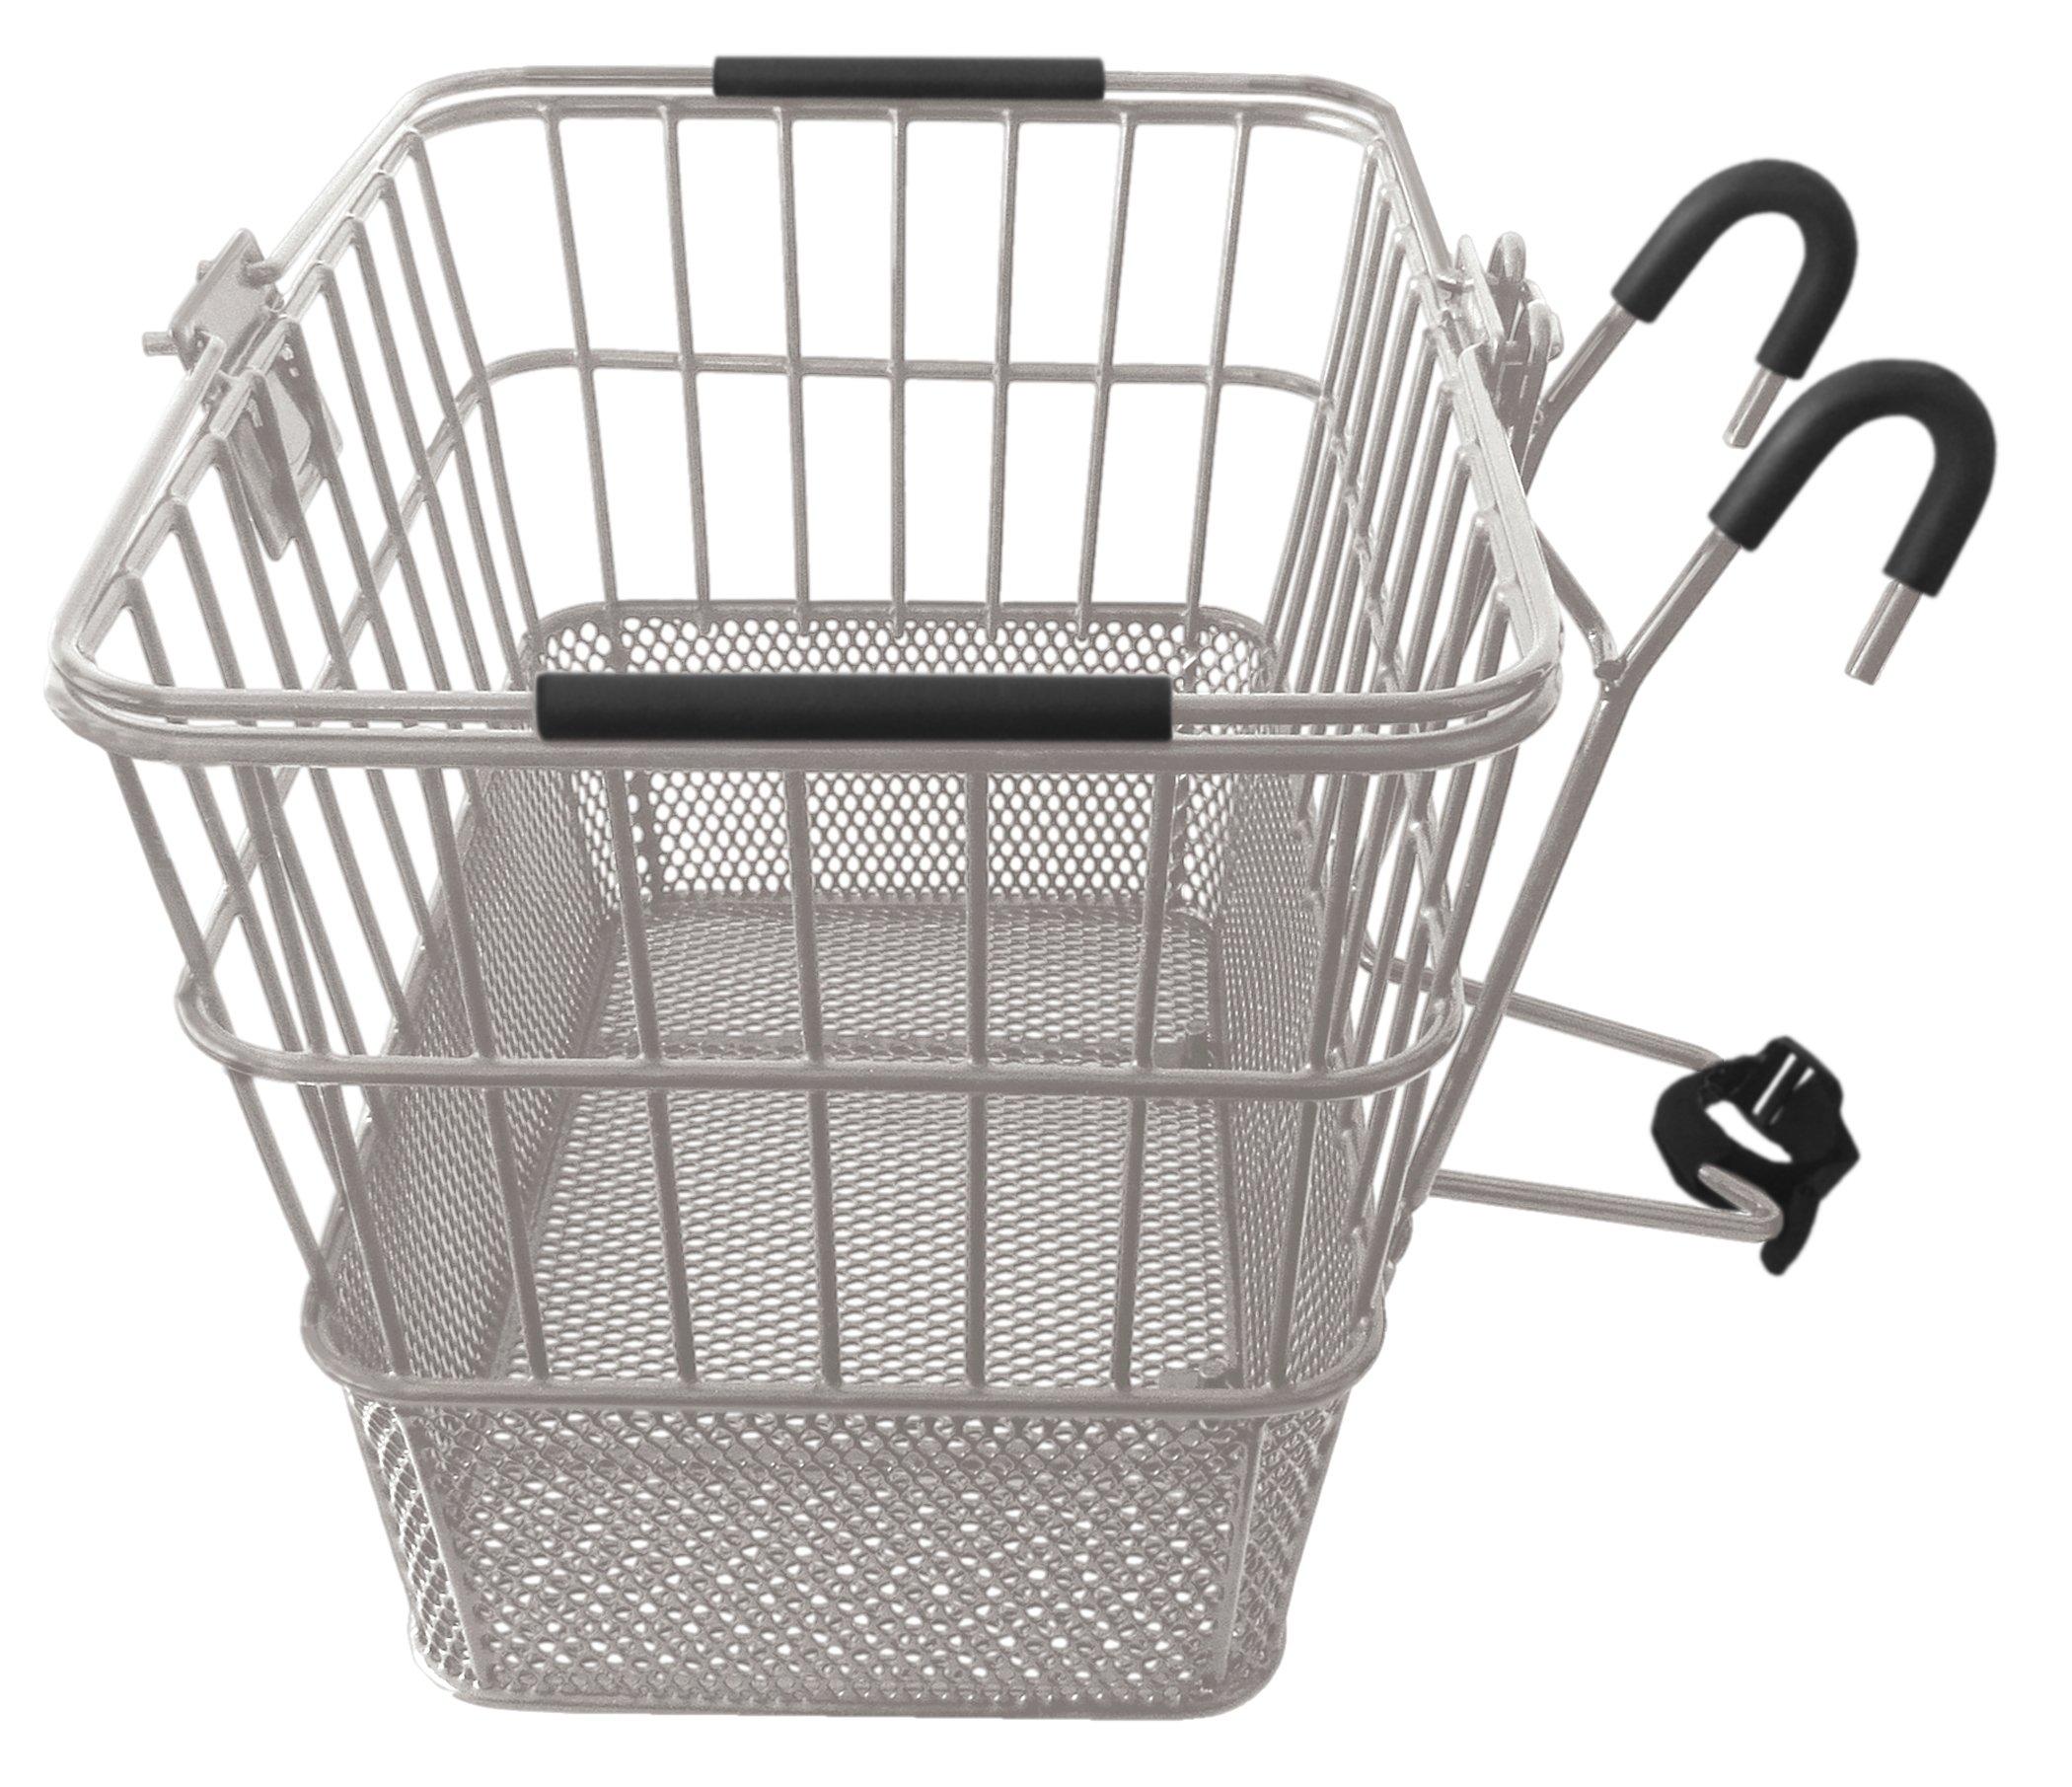 Treasure Gifts Mesh Bottom Lift-Off Basket w/Bracket, Silver